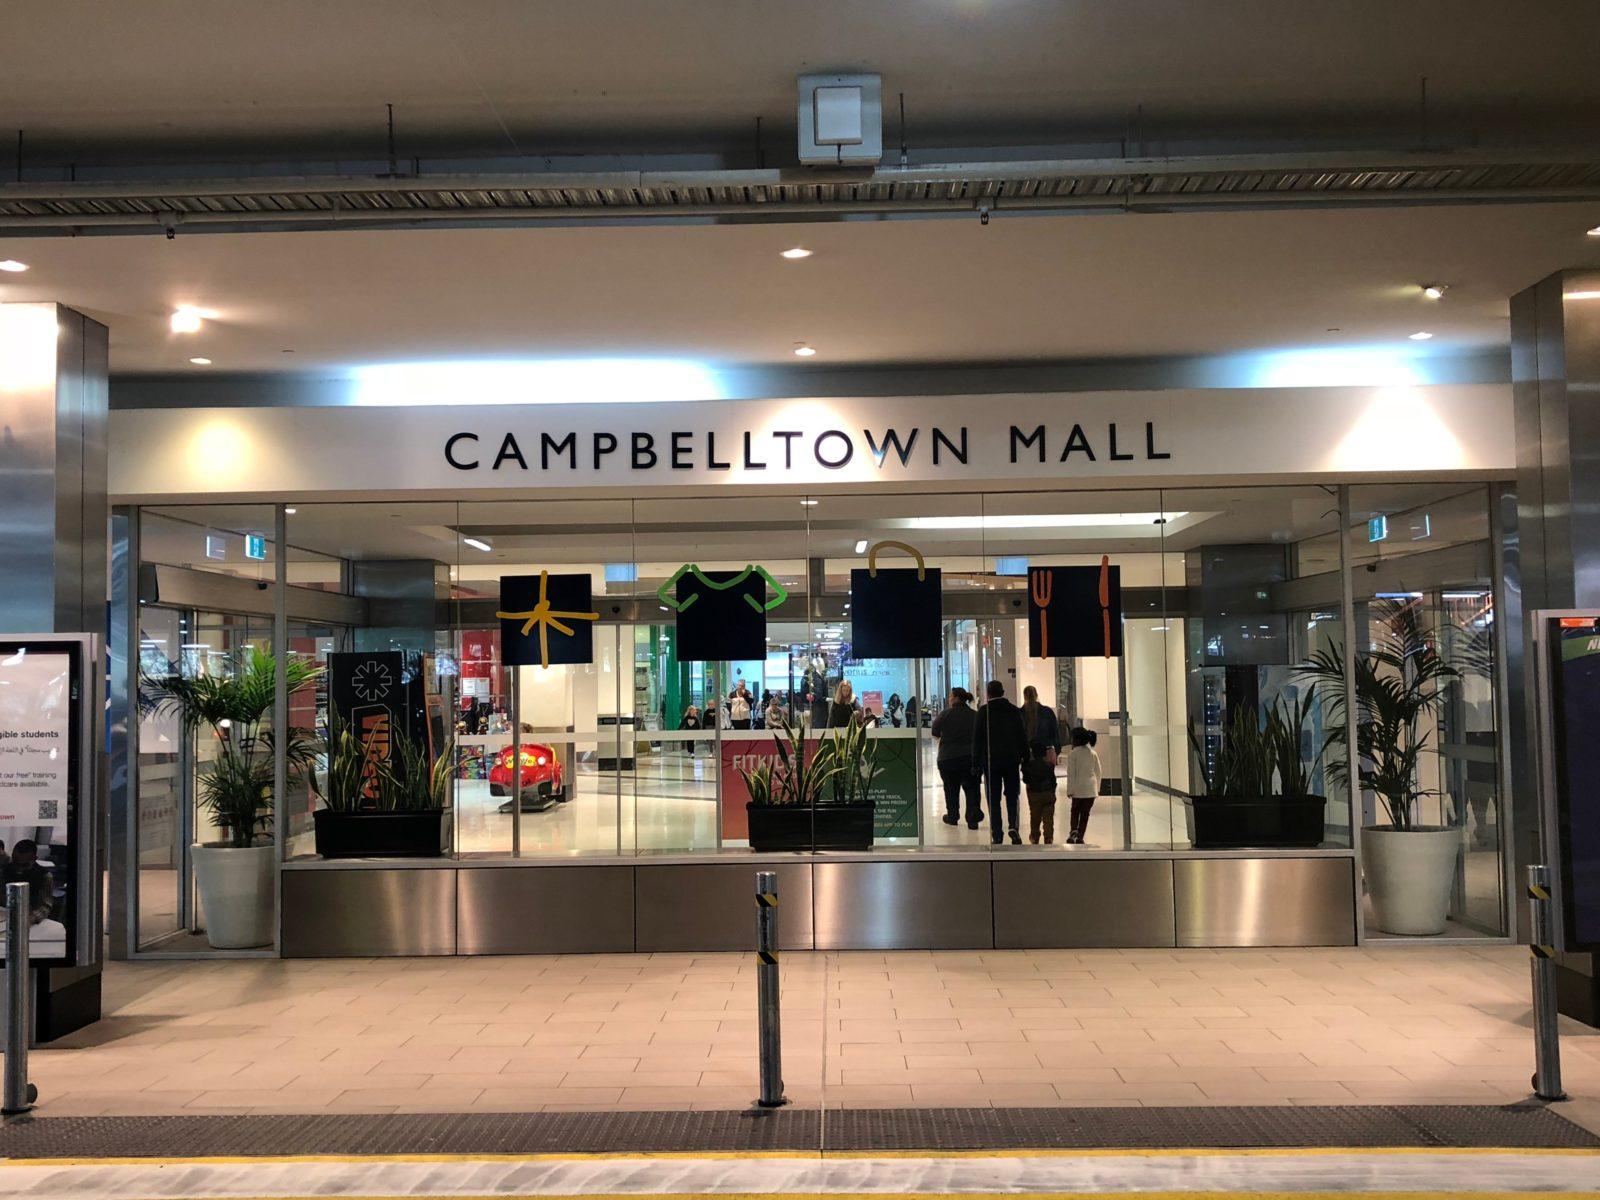 Campbelltown Mall entrance